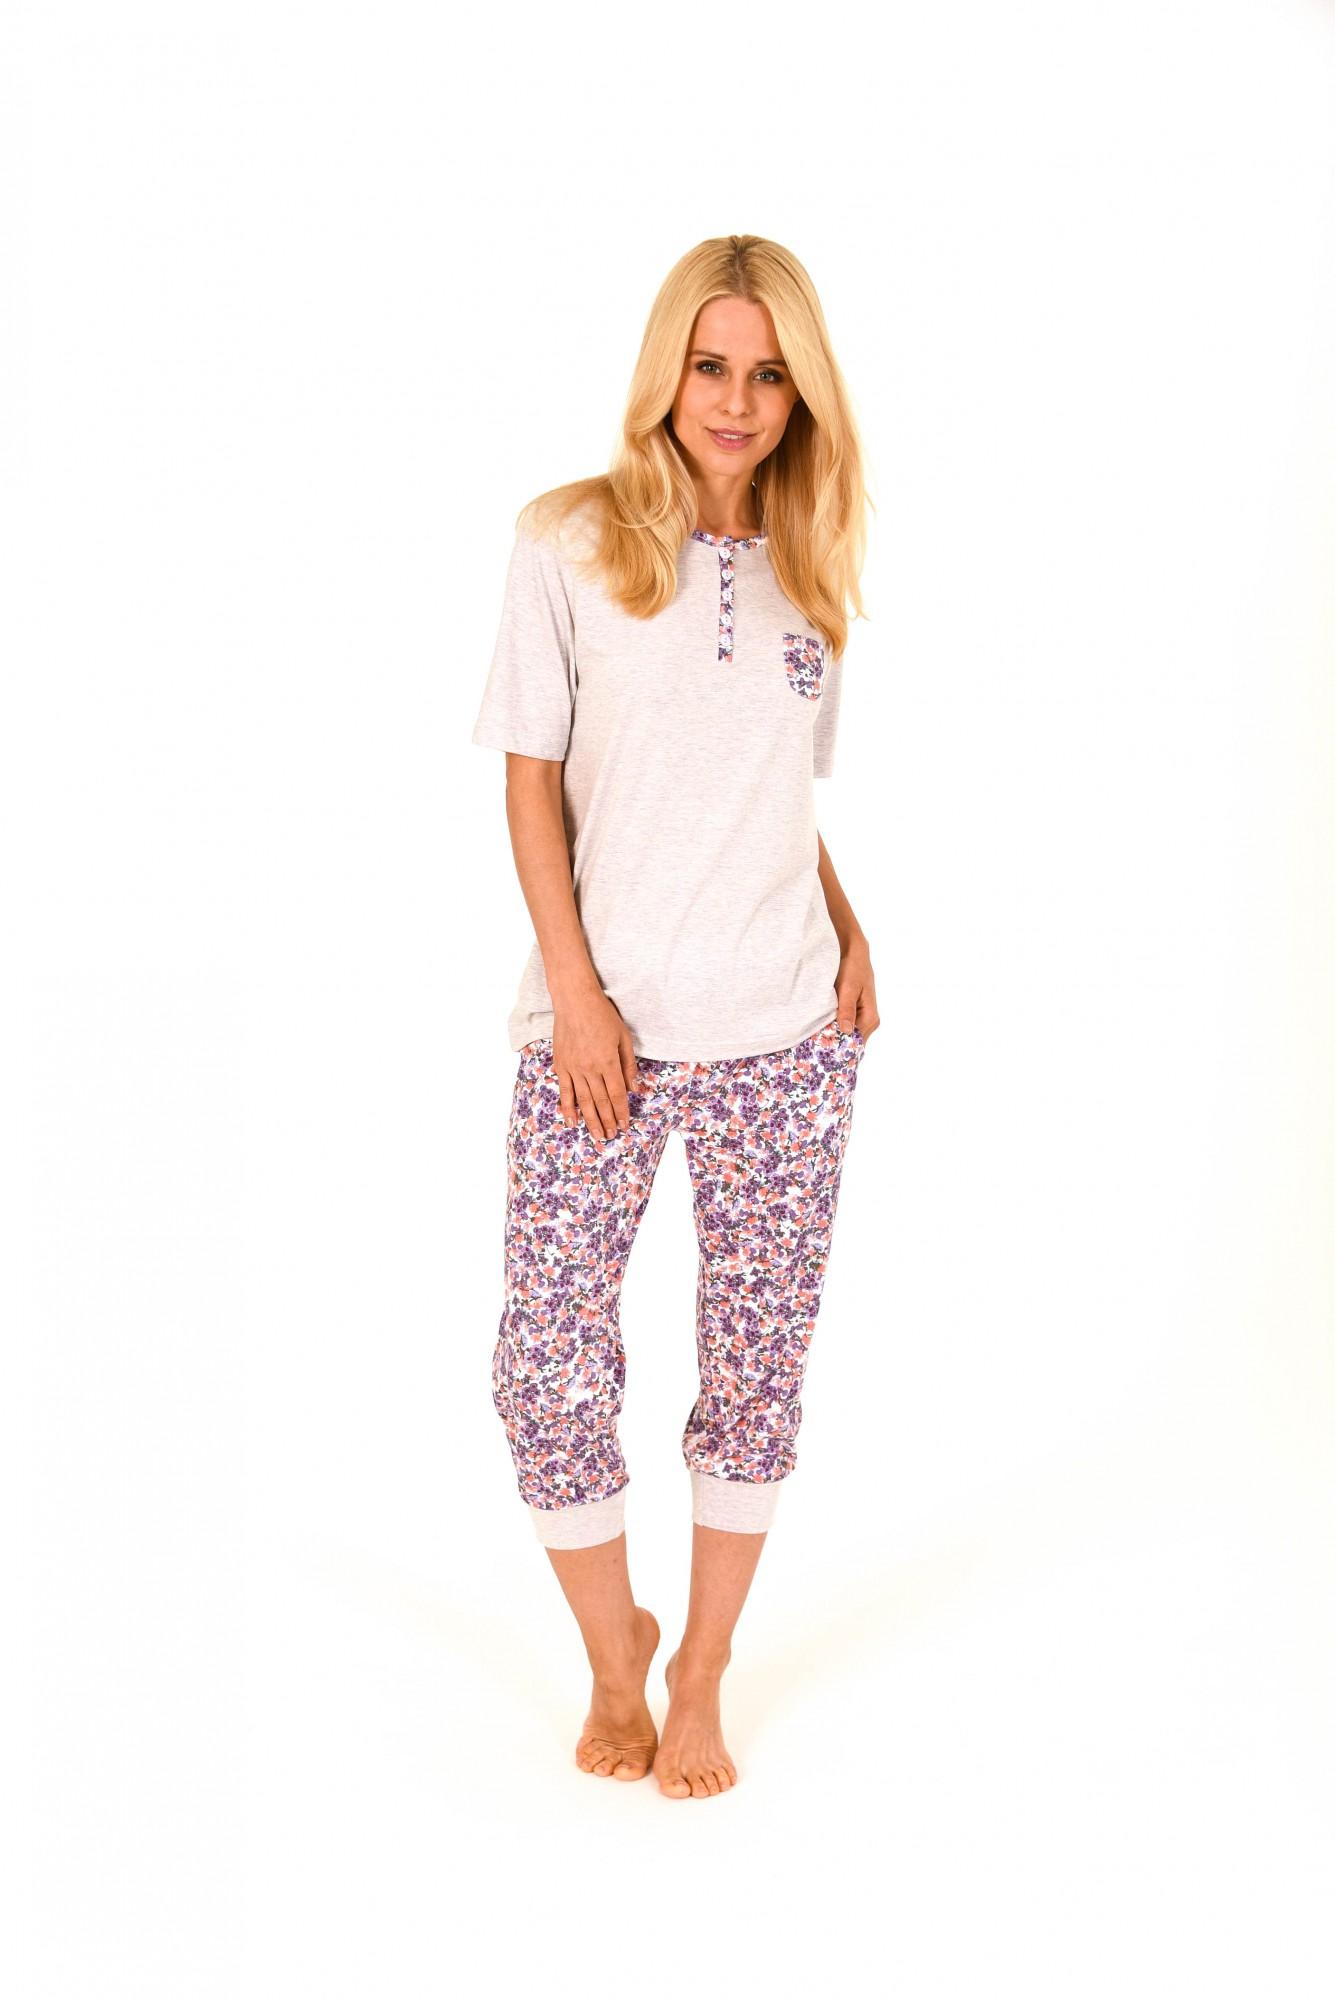 Toller Damen Pyjama kurzarm mit Caprihose  – Caprihose mit Bündchen – 171 204 90 602